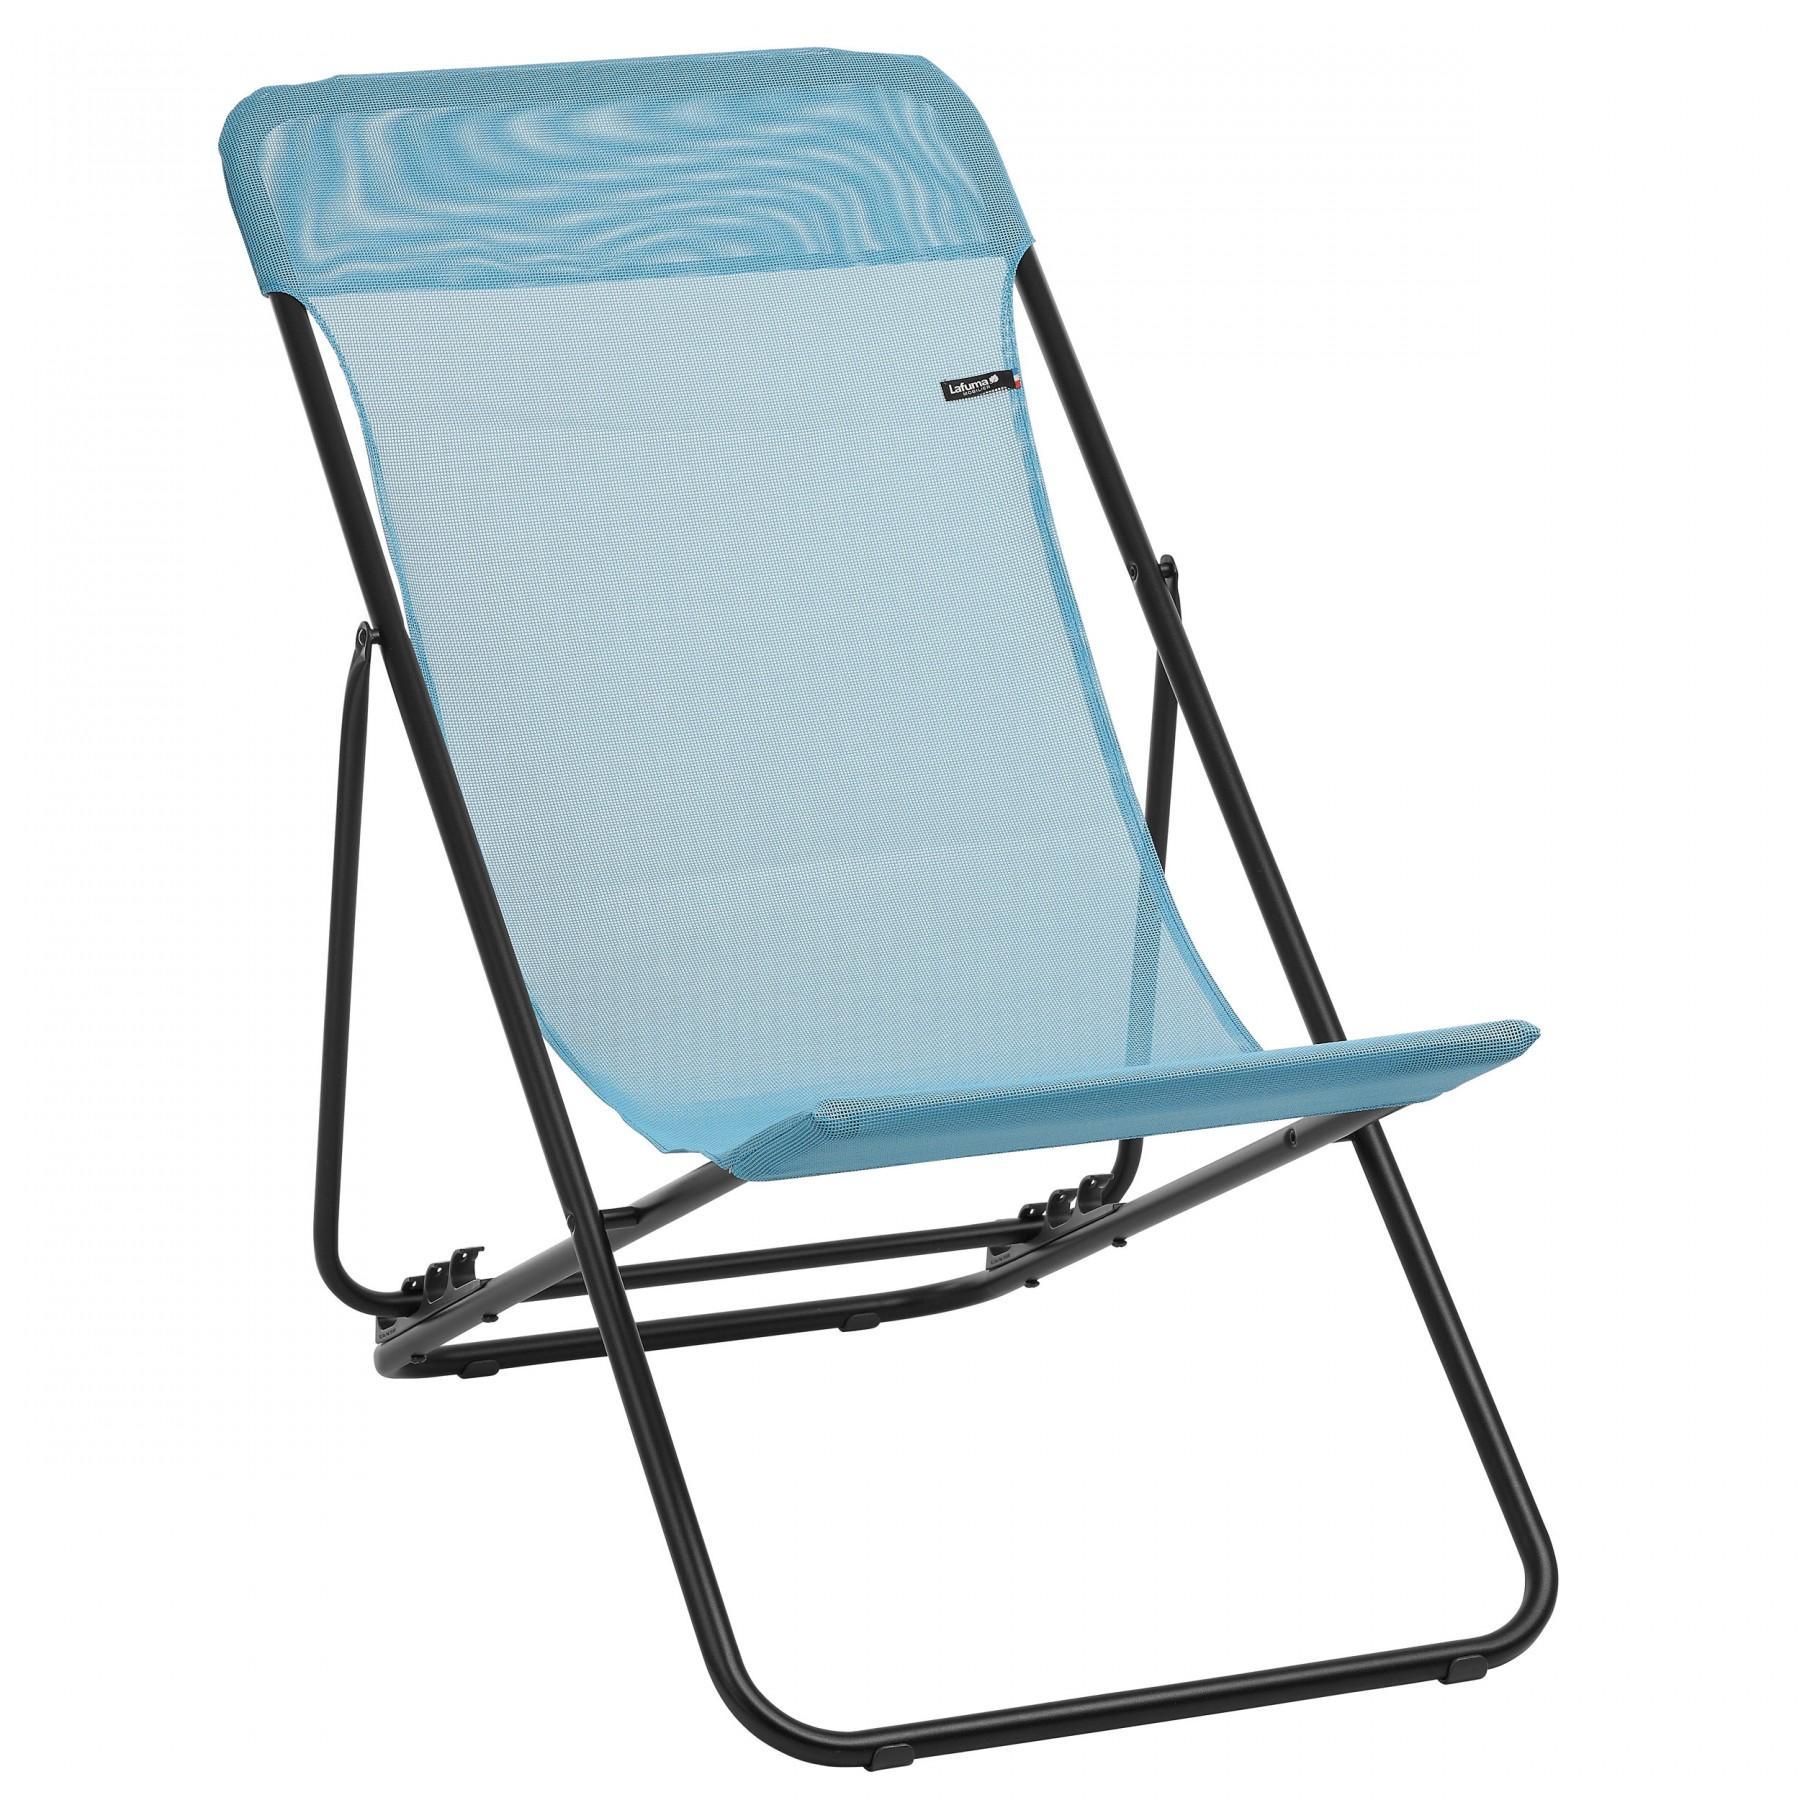 Chaise longue Lafuma Transatube - différents coloris